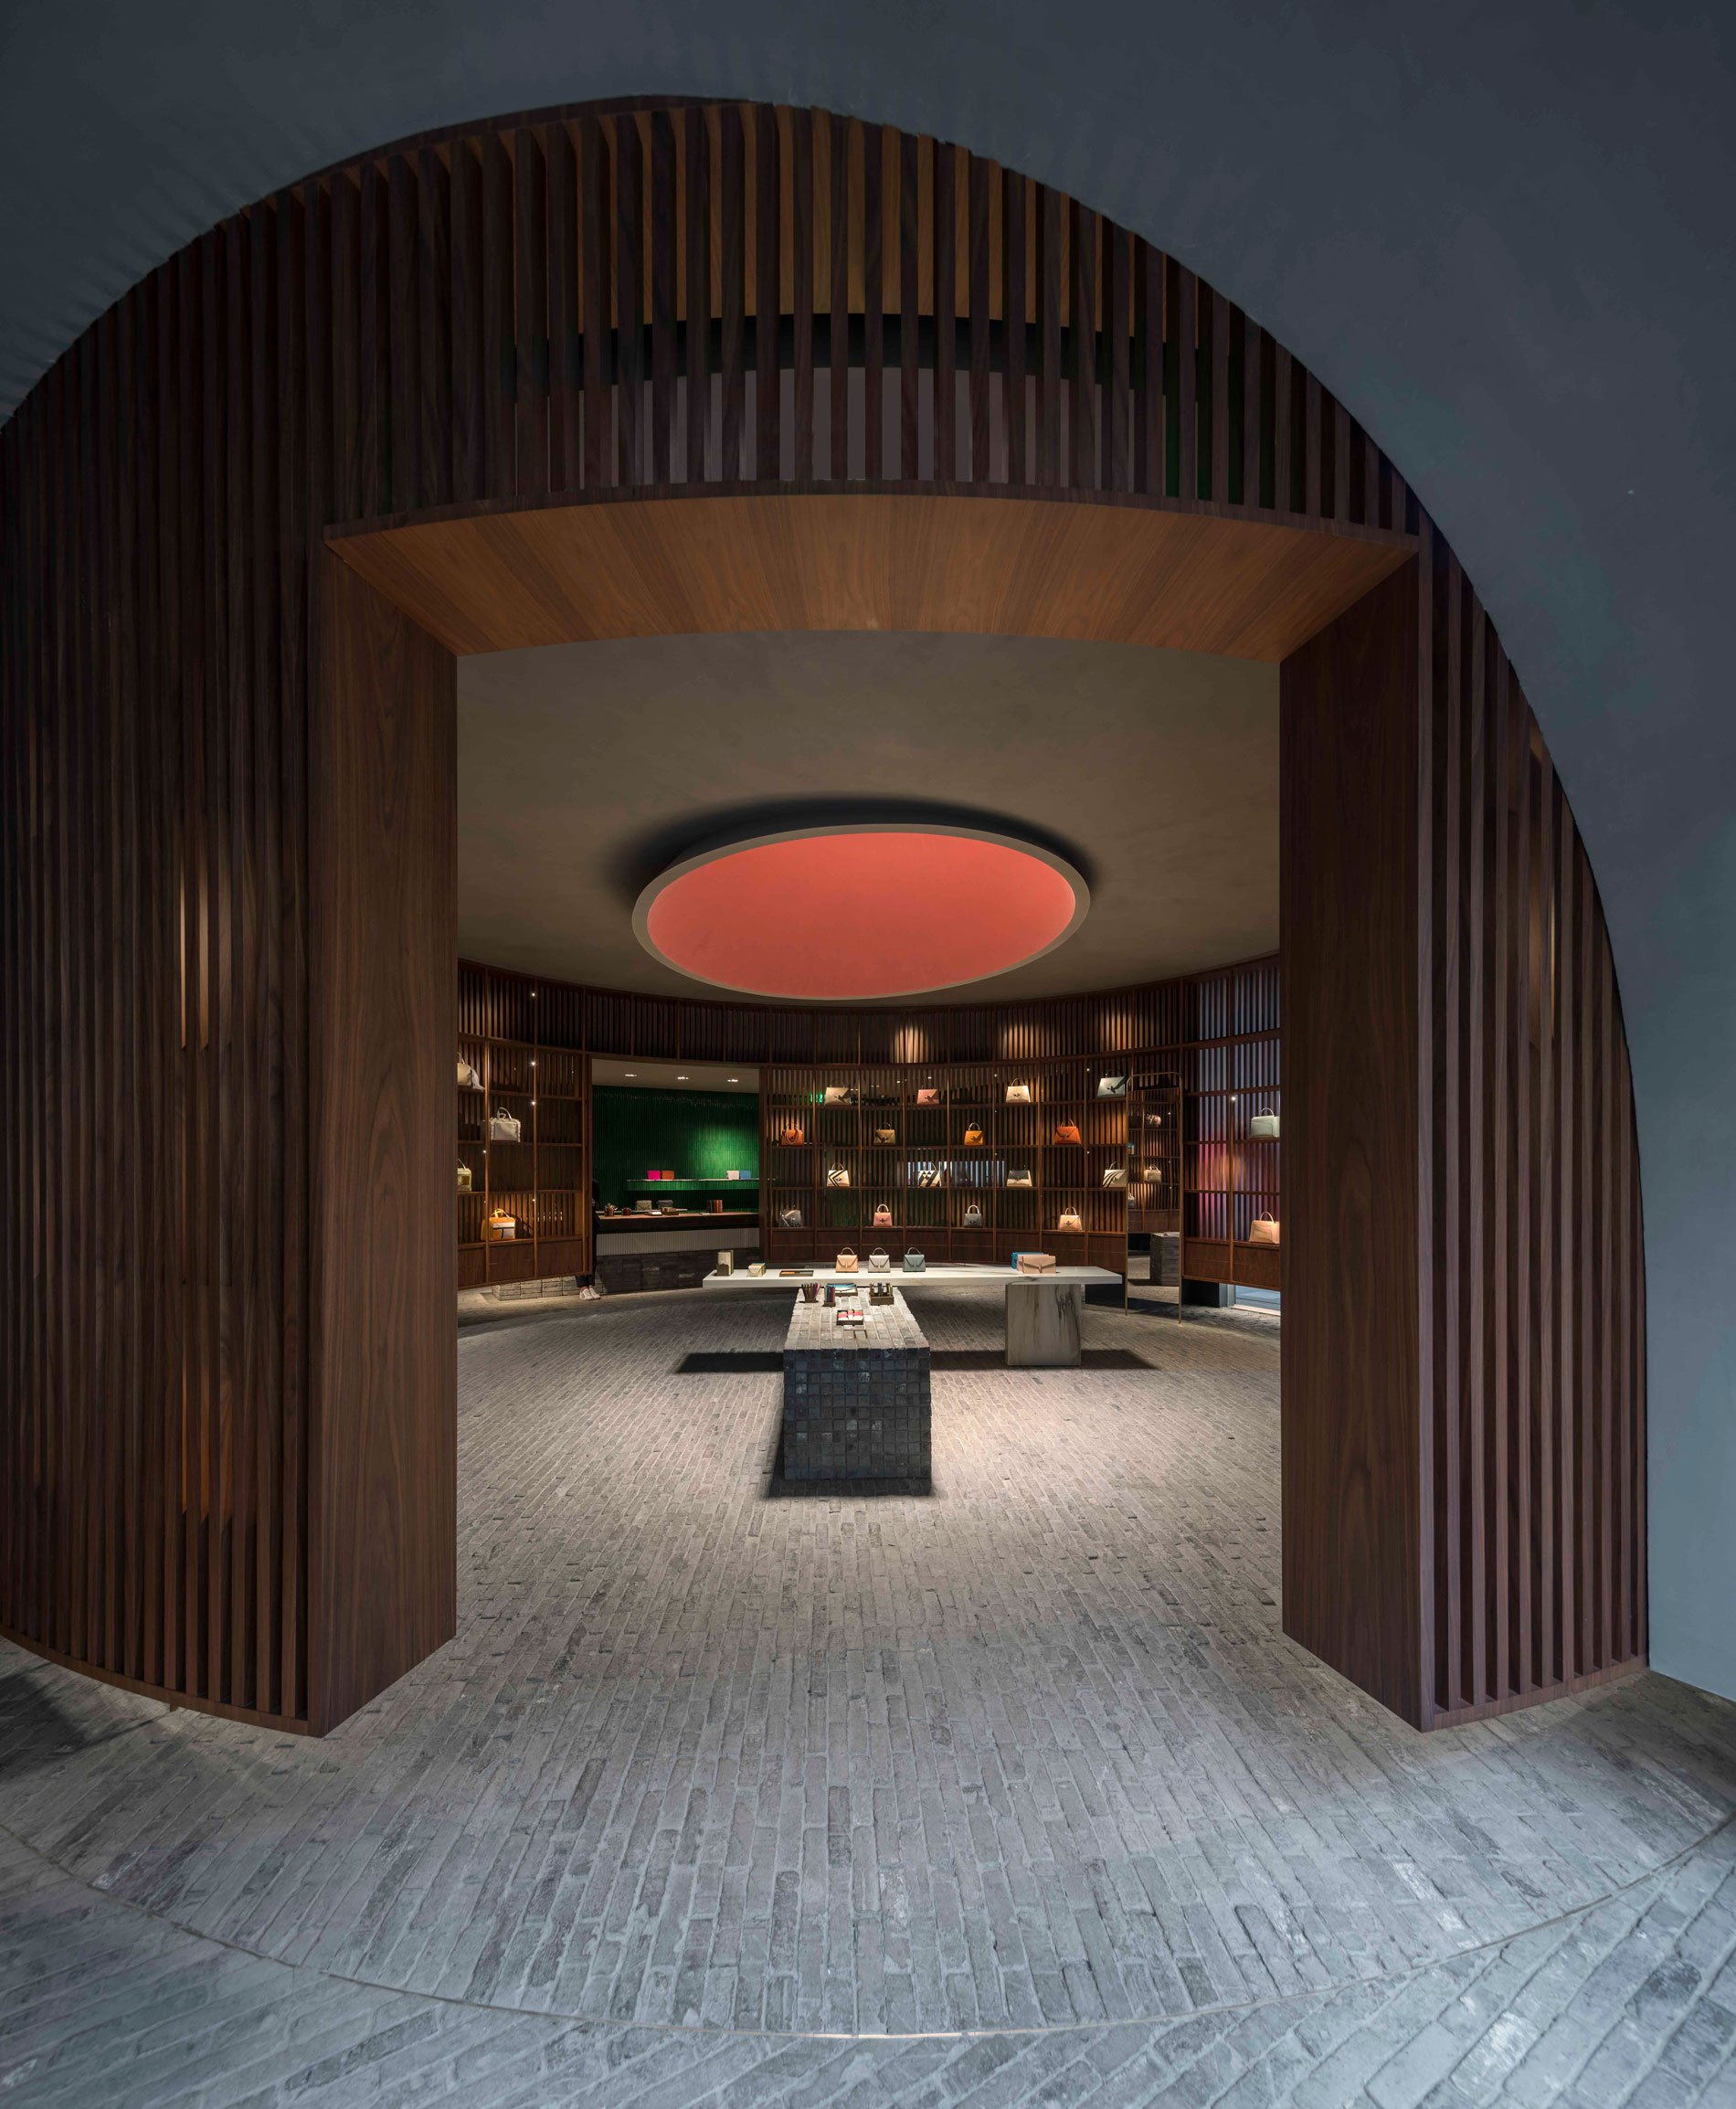 Valextra Chengdu Designed by Neri&Hu Pedro Pegenaute